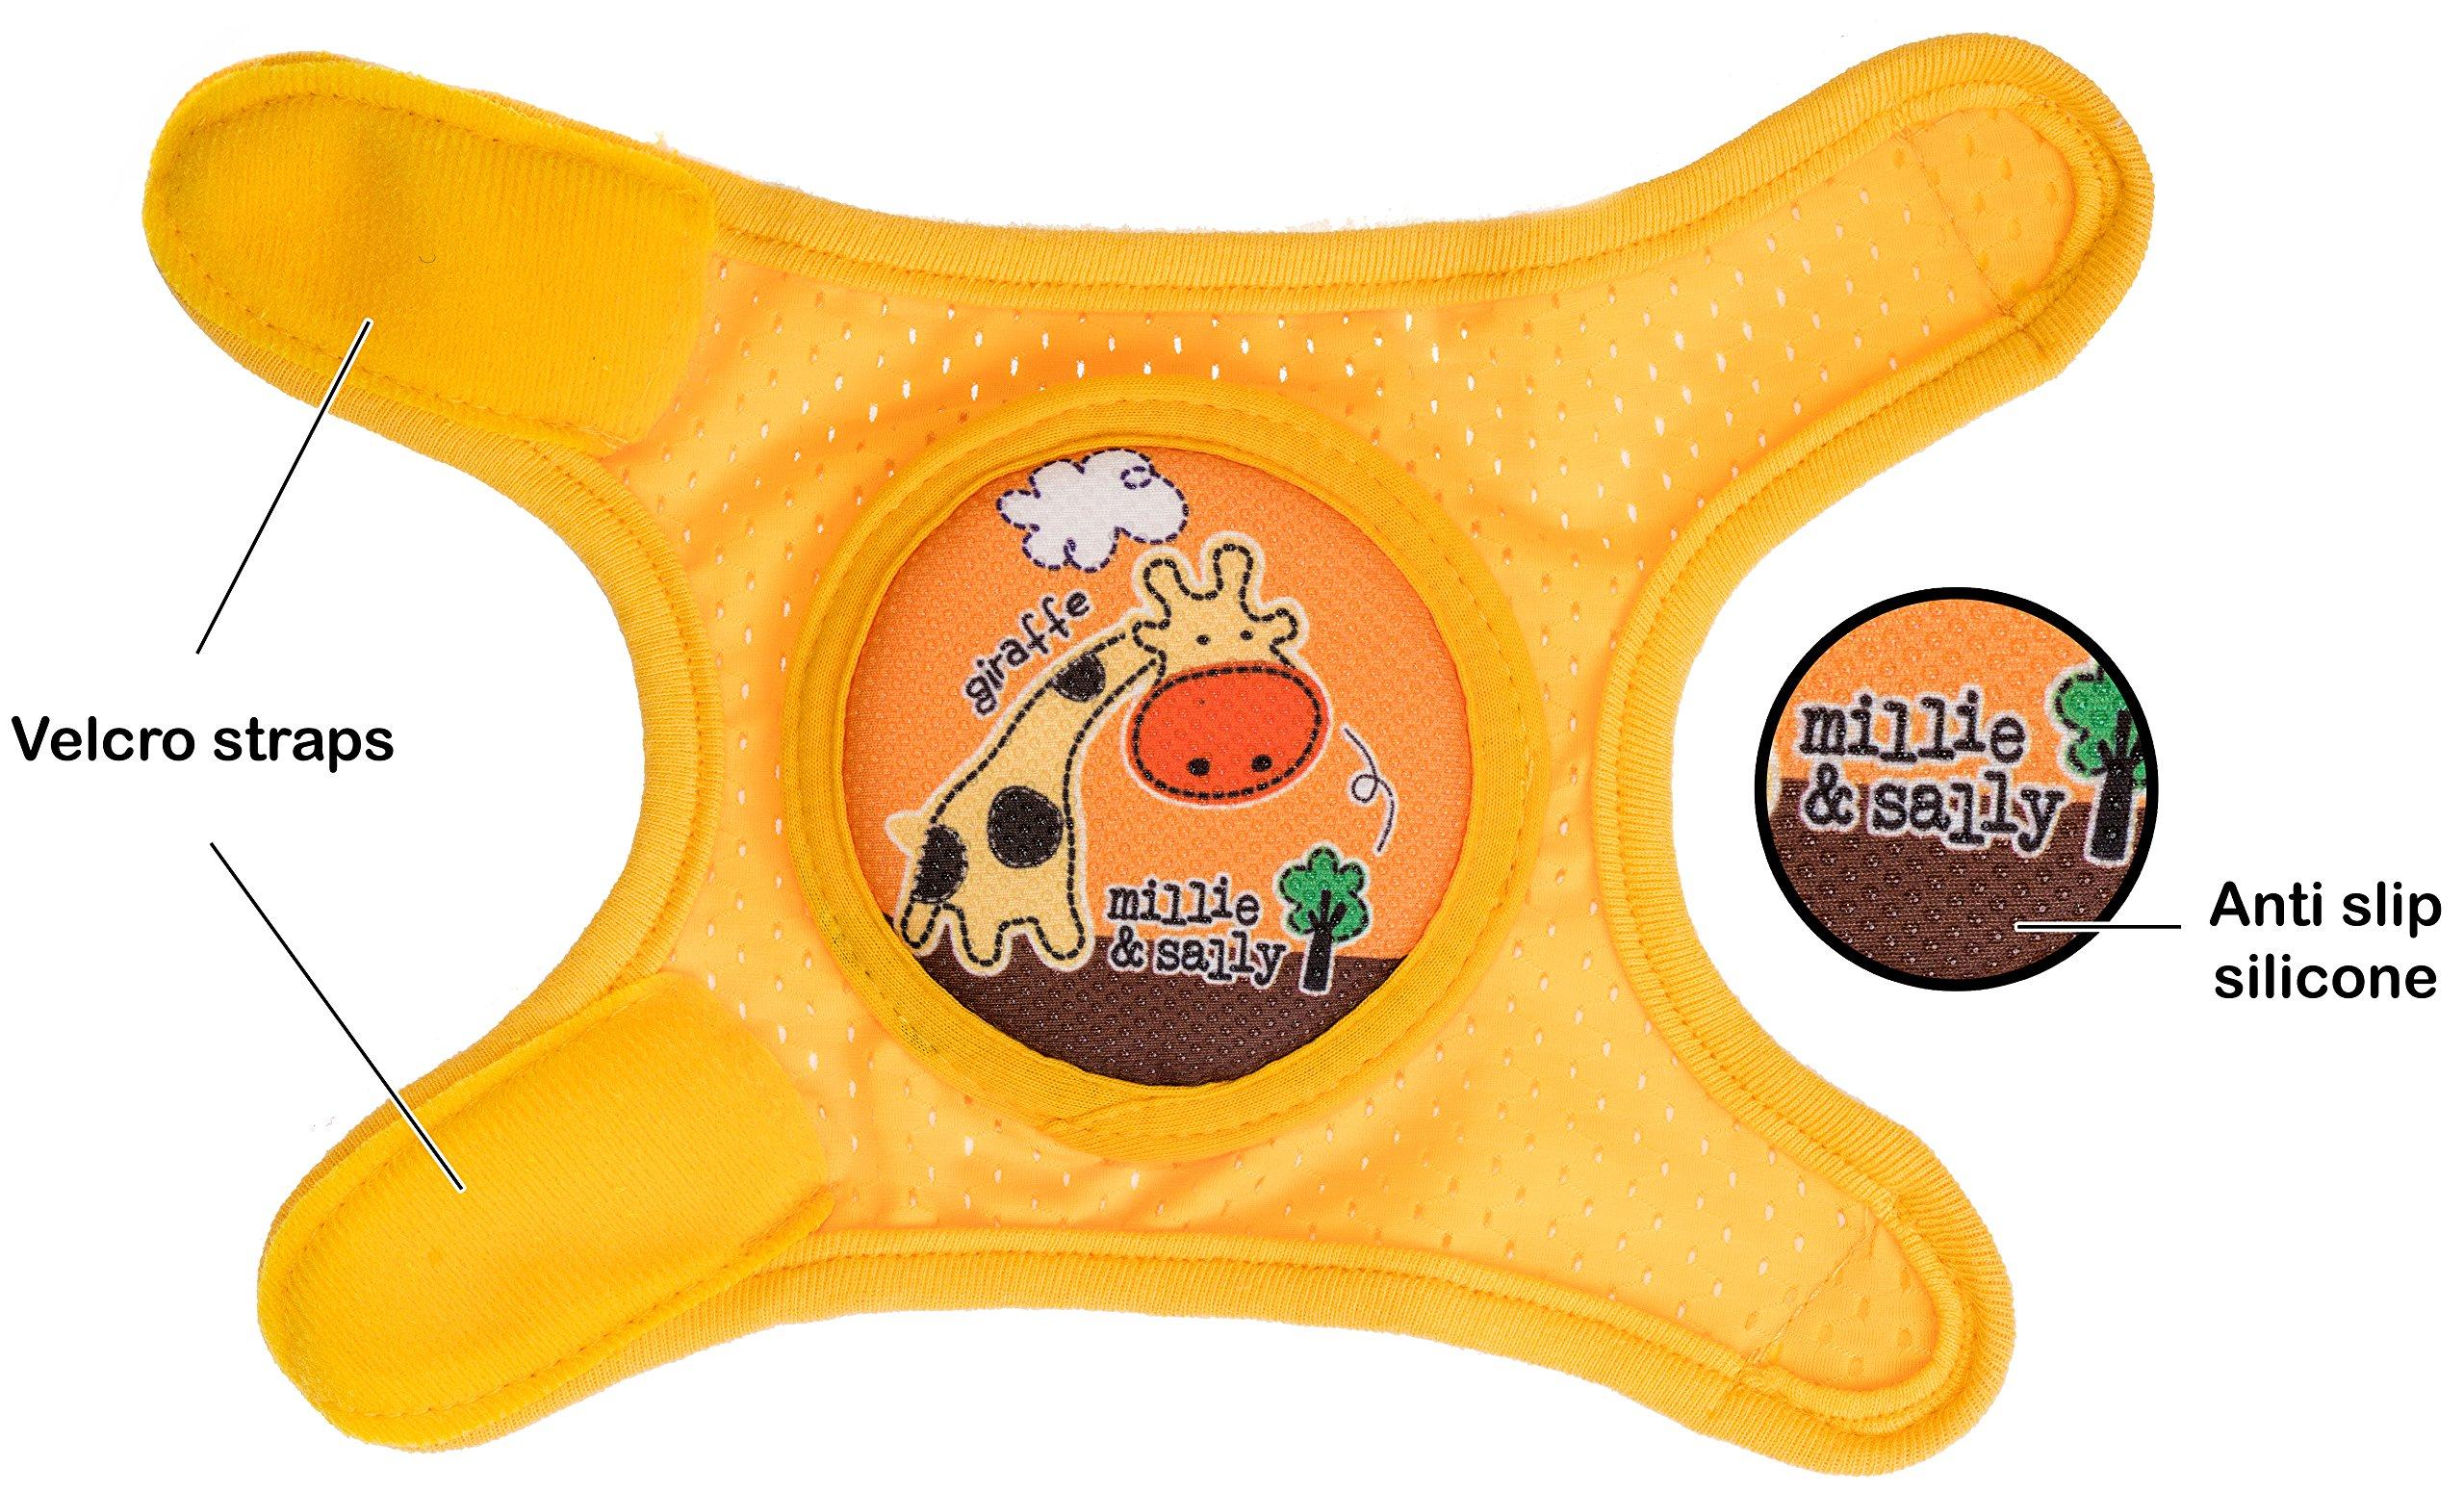 Baby Knee Pads Anti-Slip Walking Kneepads Adjustable Hook & Loop Strap Unisex For Boys Girls Infant Toddler Knee & Elbow Pads Memory Foam Pad Cushion Breathable Mesh Fabric Knee Pads For Babies by Kstar (Image #6)